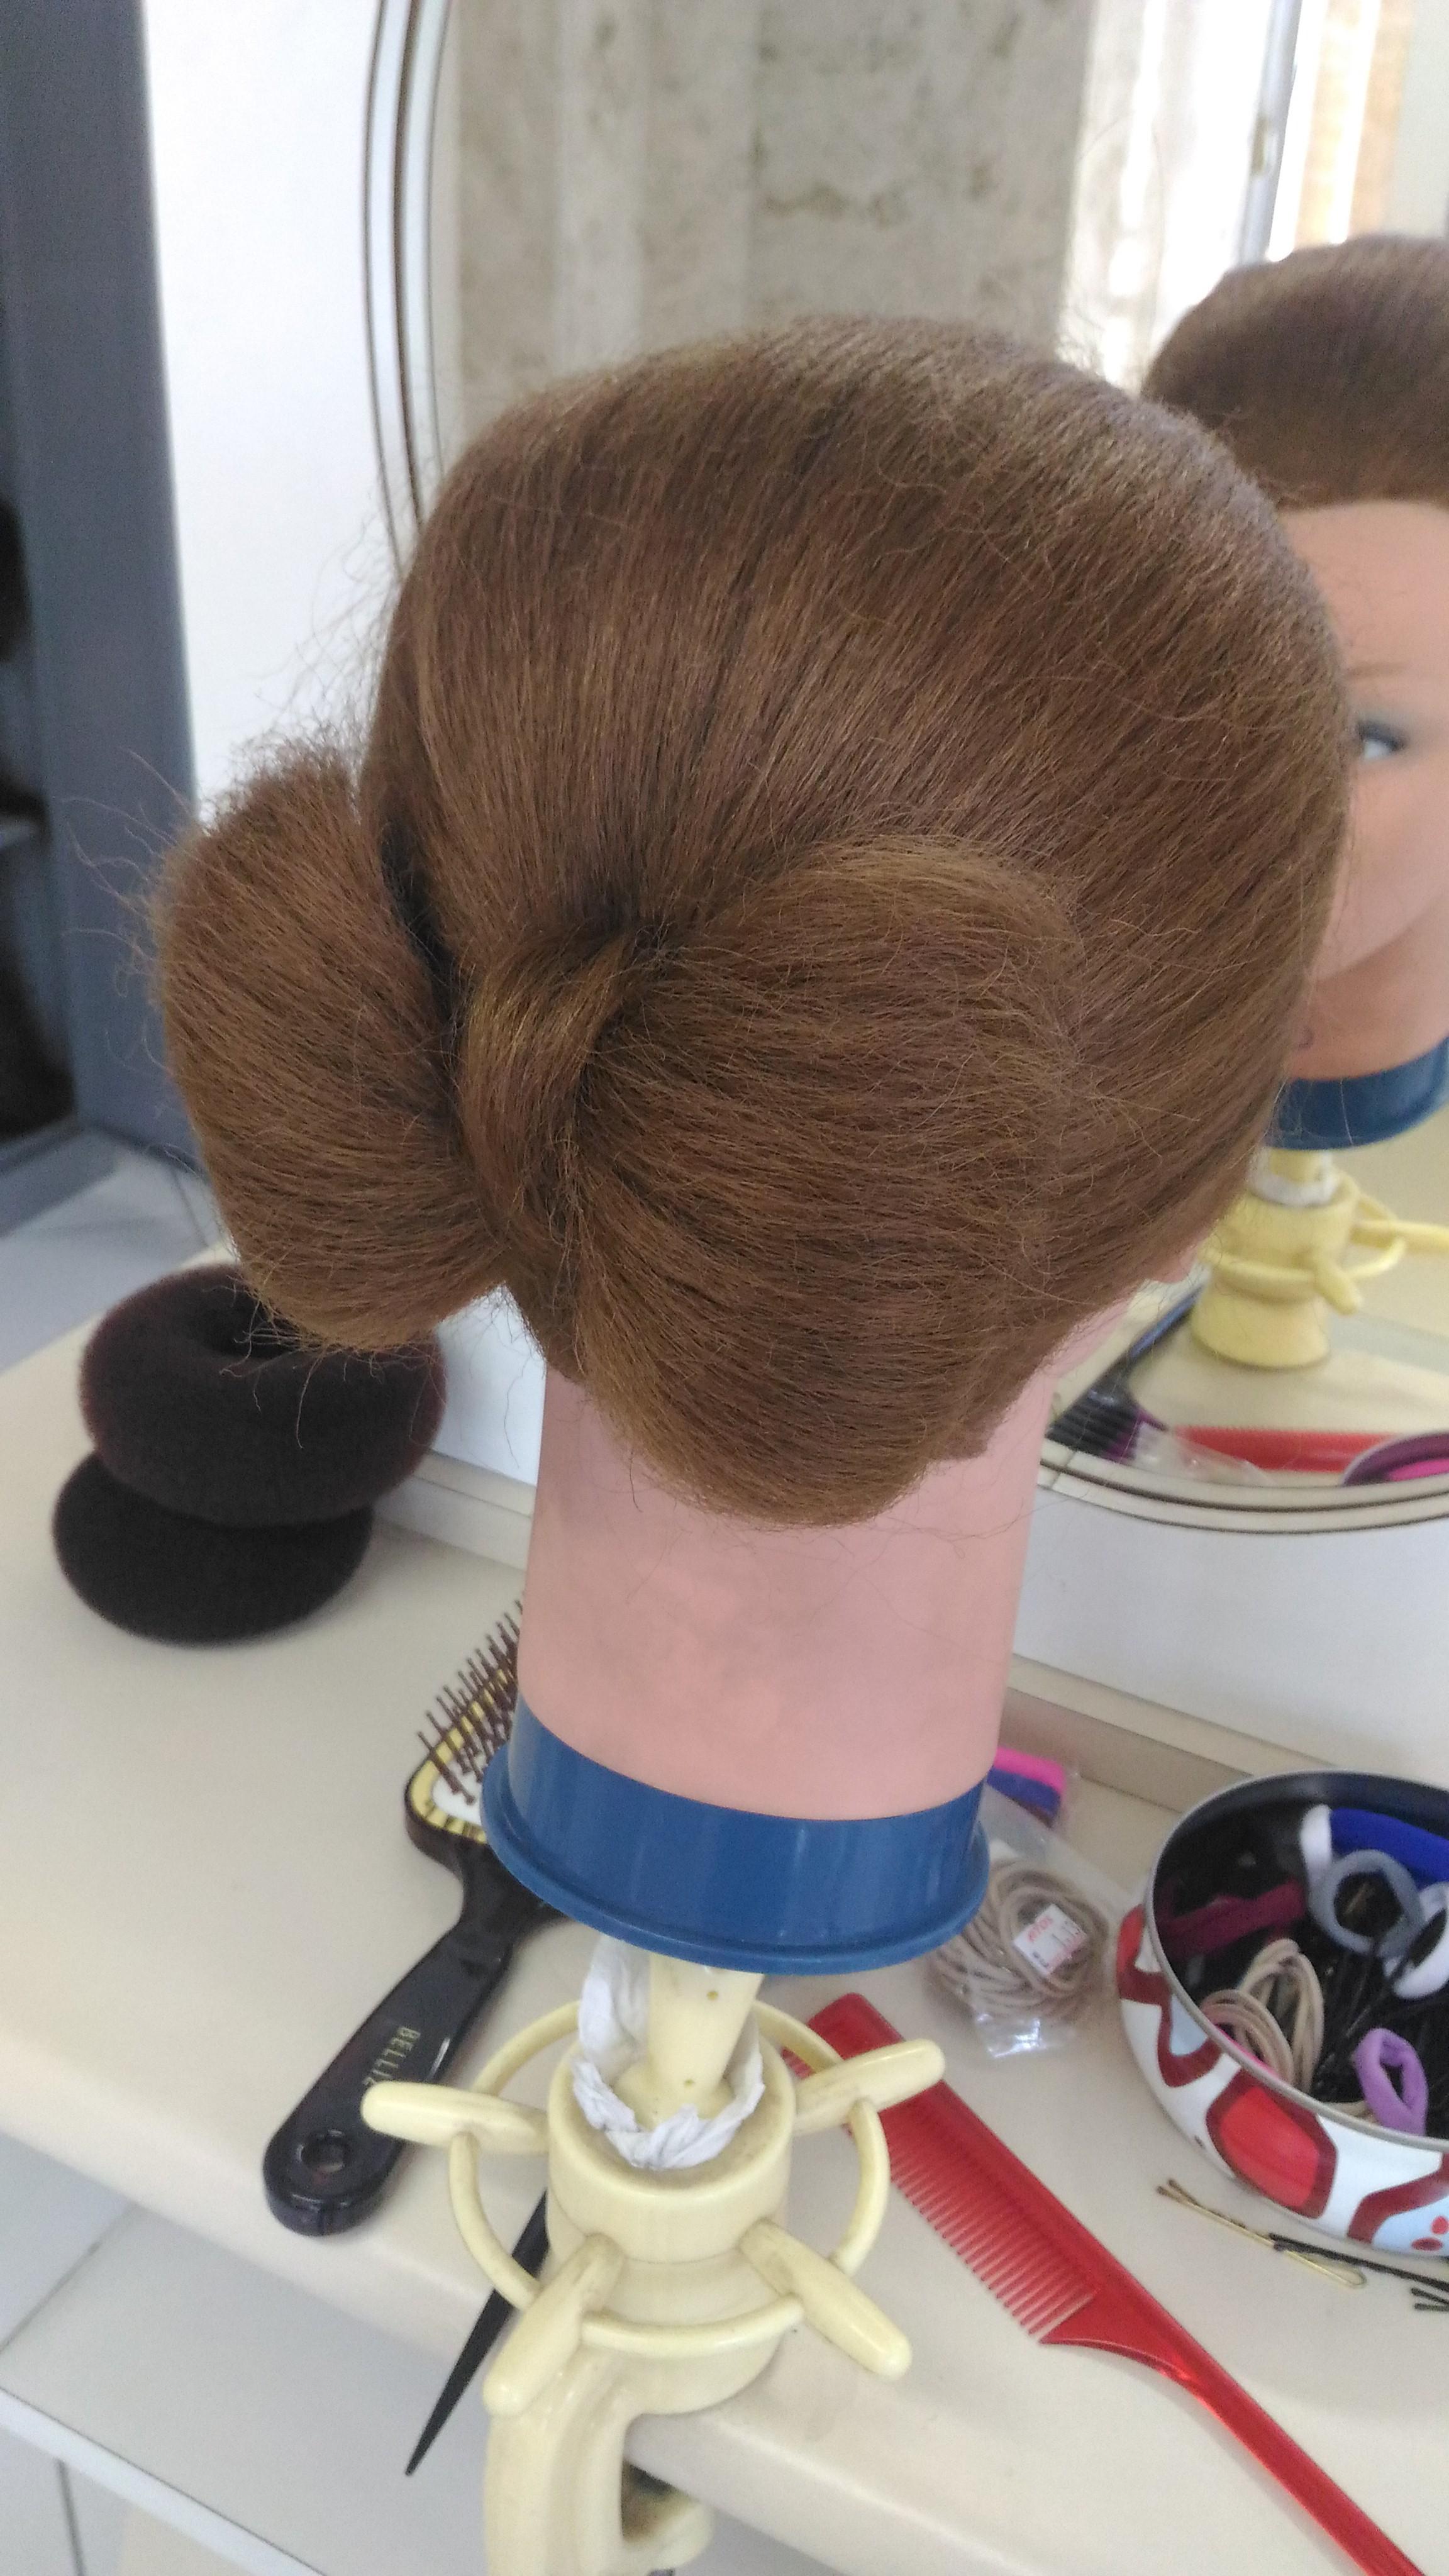 #penteado #laço cabelo estudante (esteticista) auxiliar cabeleireiro(a) estudante (designer sobrancelha) barbeiro(a) escovista cabeleireiro(a)